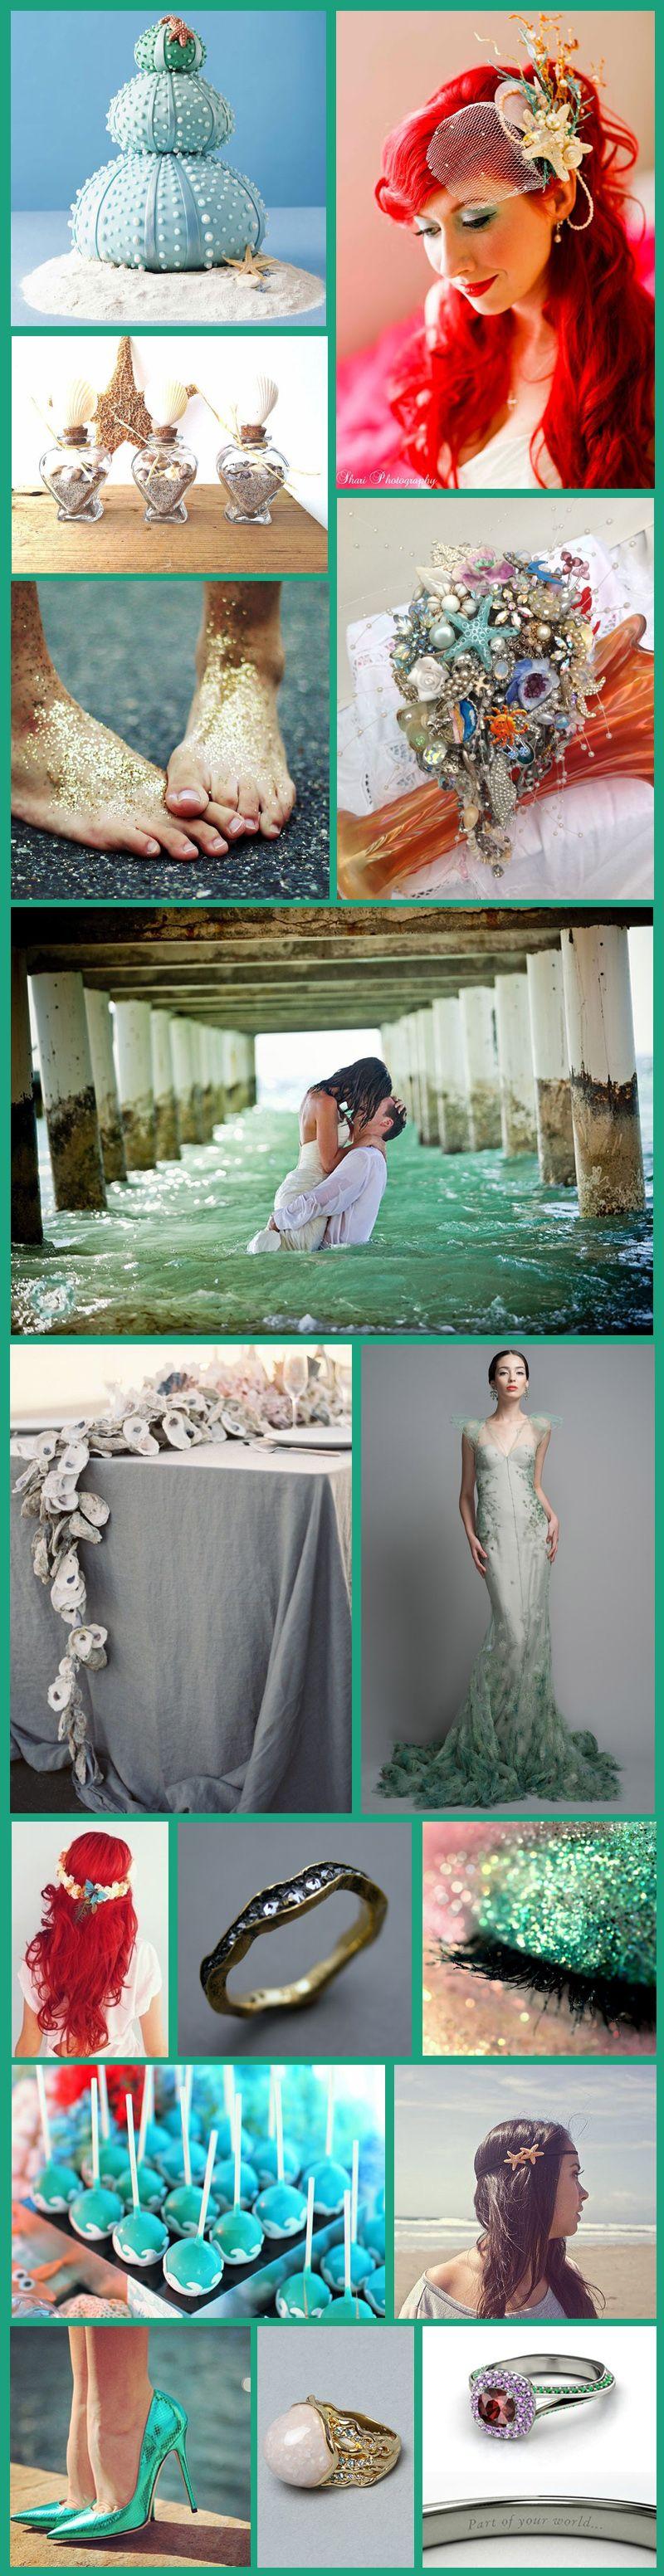 Bridal Boutique Disney S Fairy Tale Weddings Honeymoons Ariel Wedding Dress Wedding Dresses Ariel Wedding [ 1107 x 750 Pixel ]